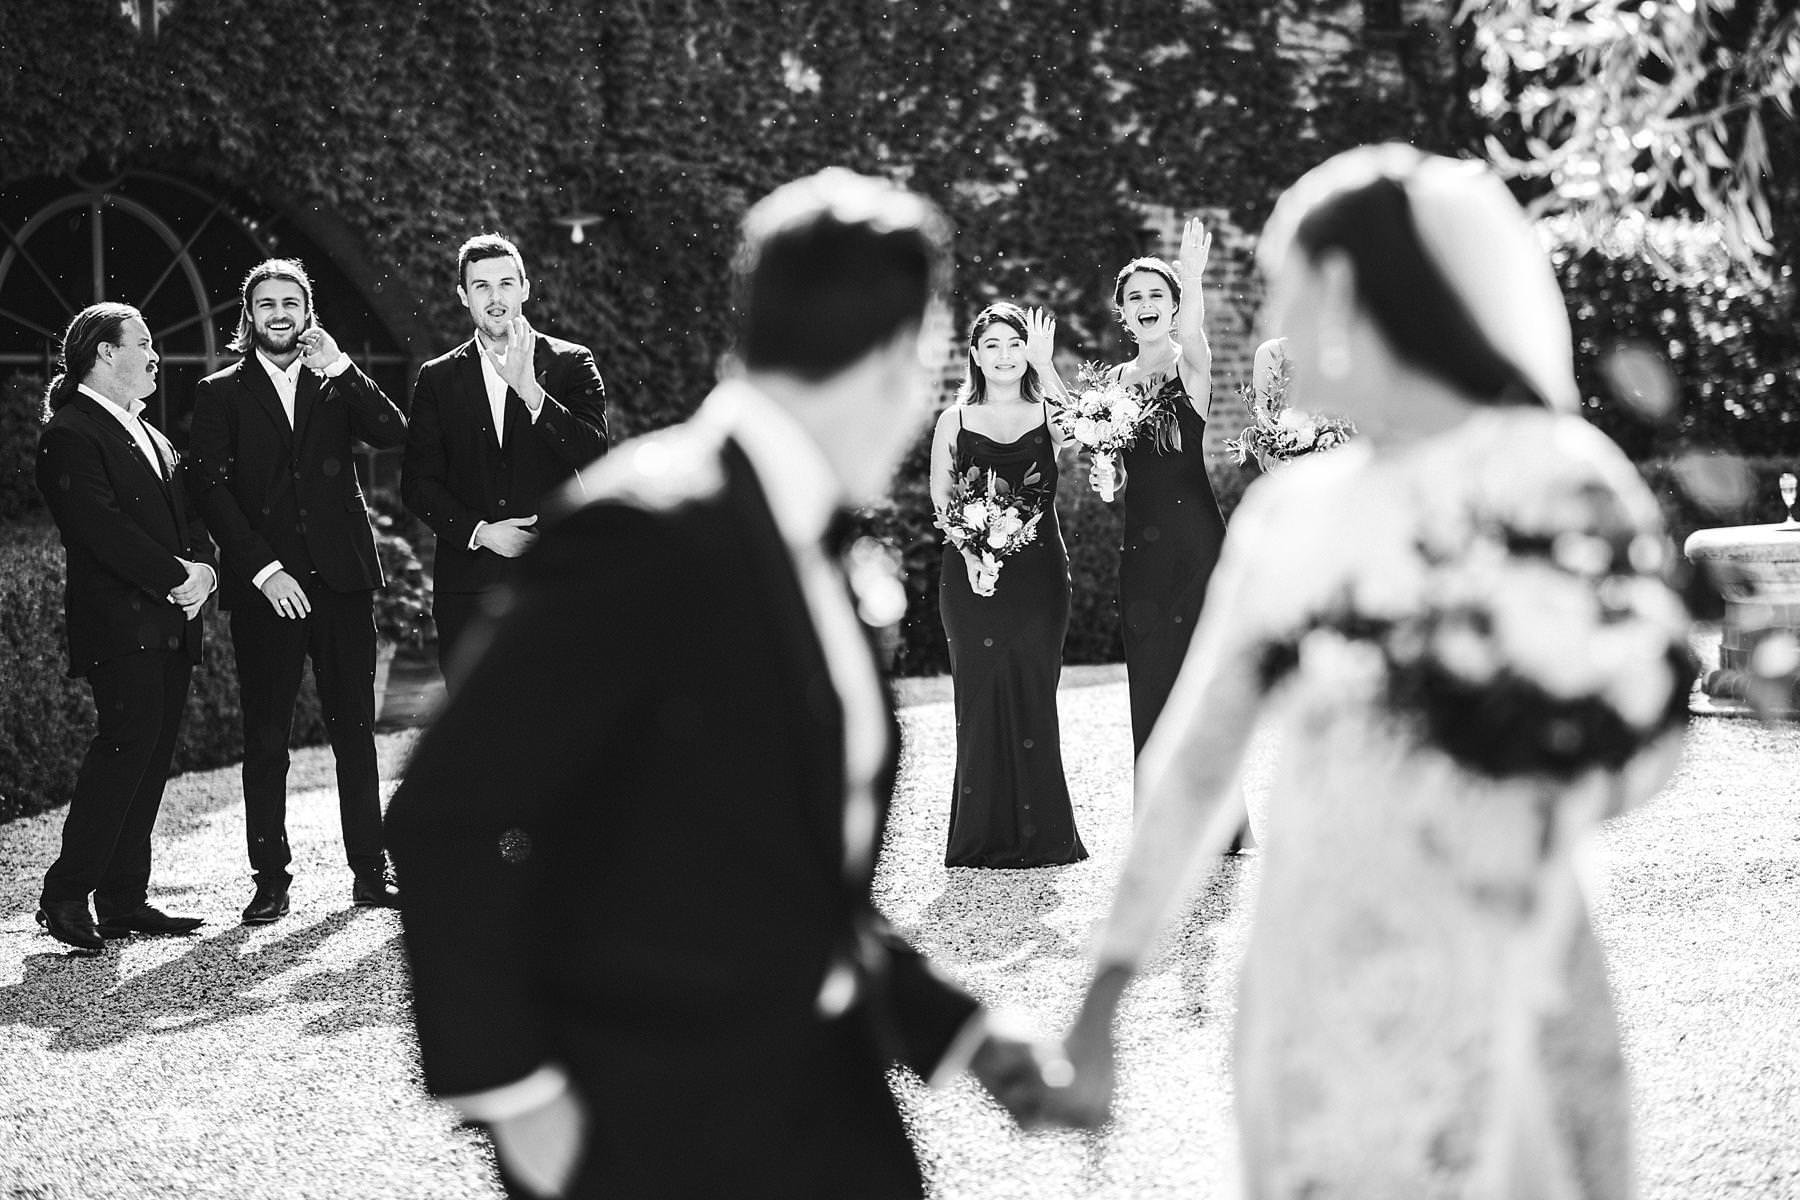 Exciting bridal party wedding photo at intimate destination wedding in Umbria at Antica Posta venue